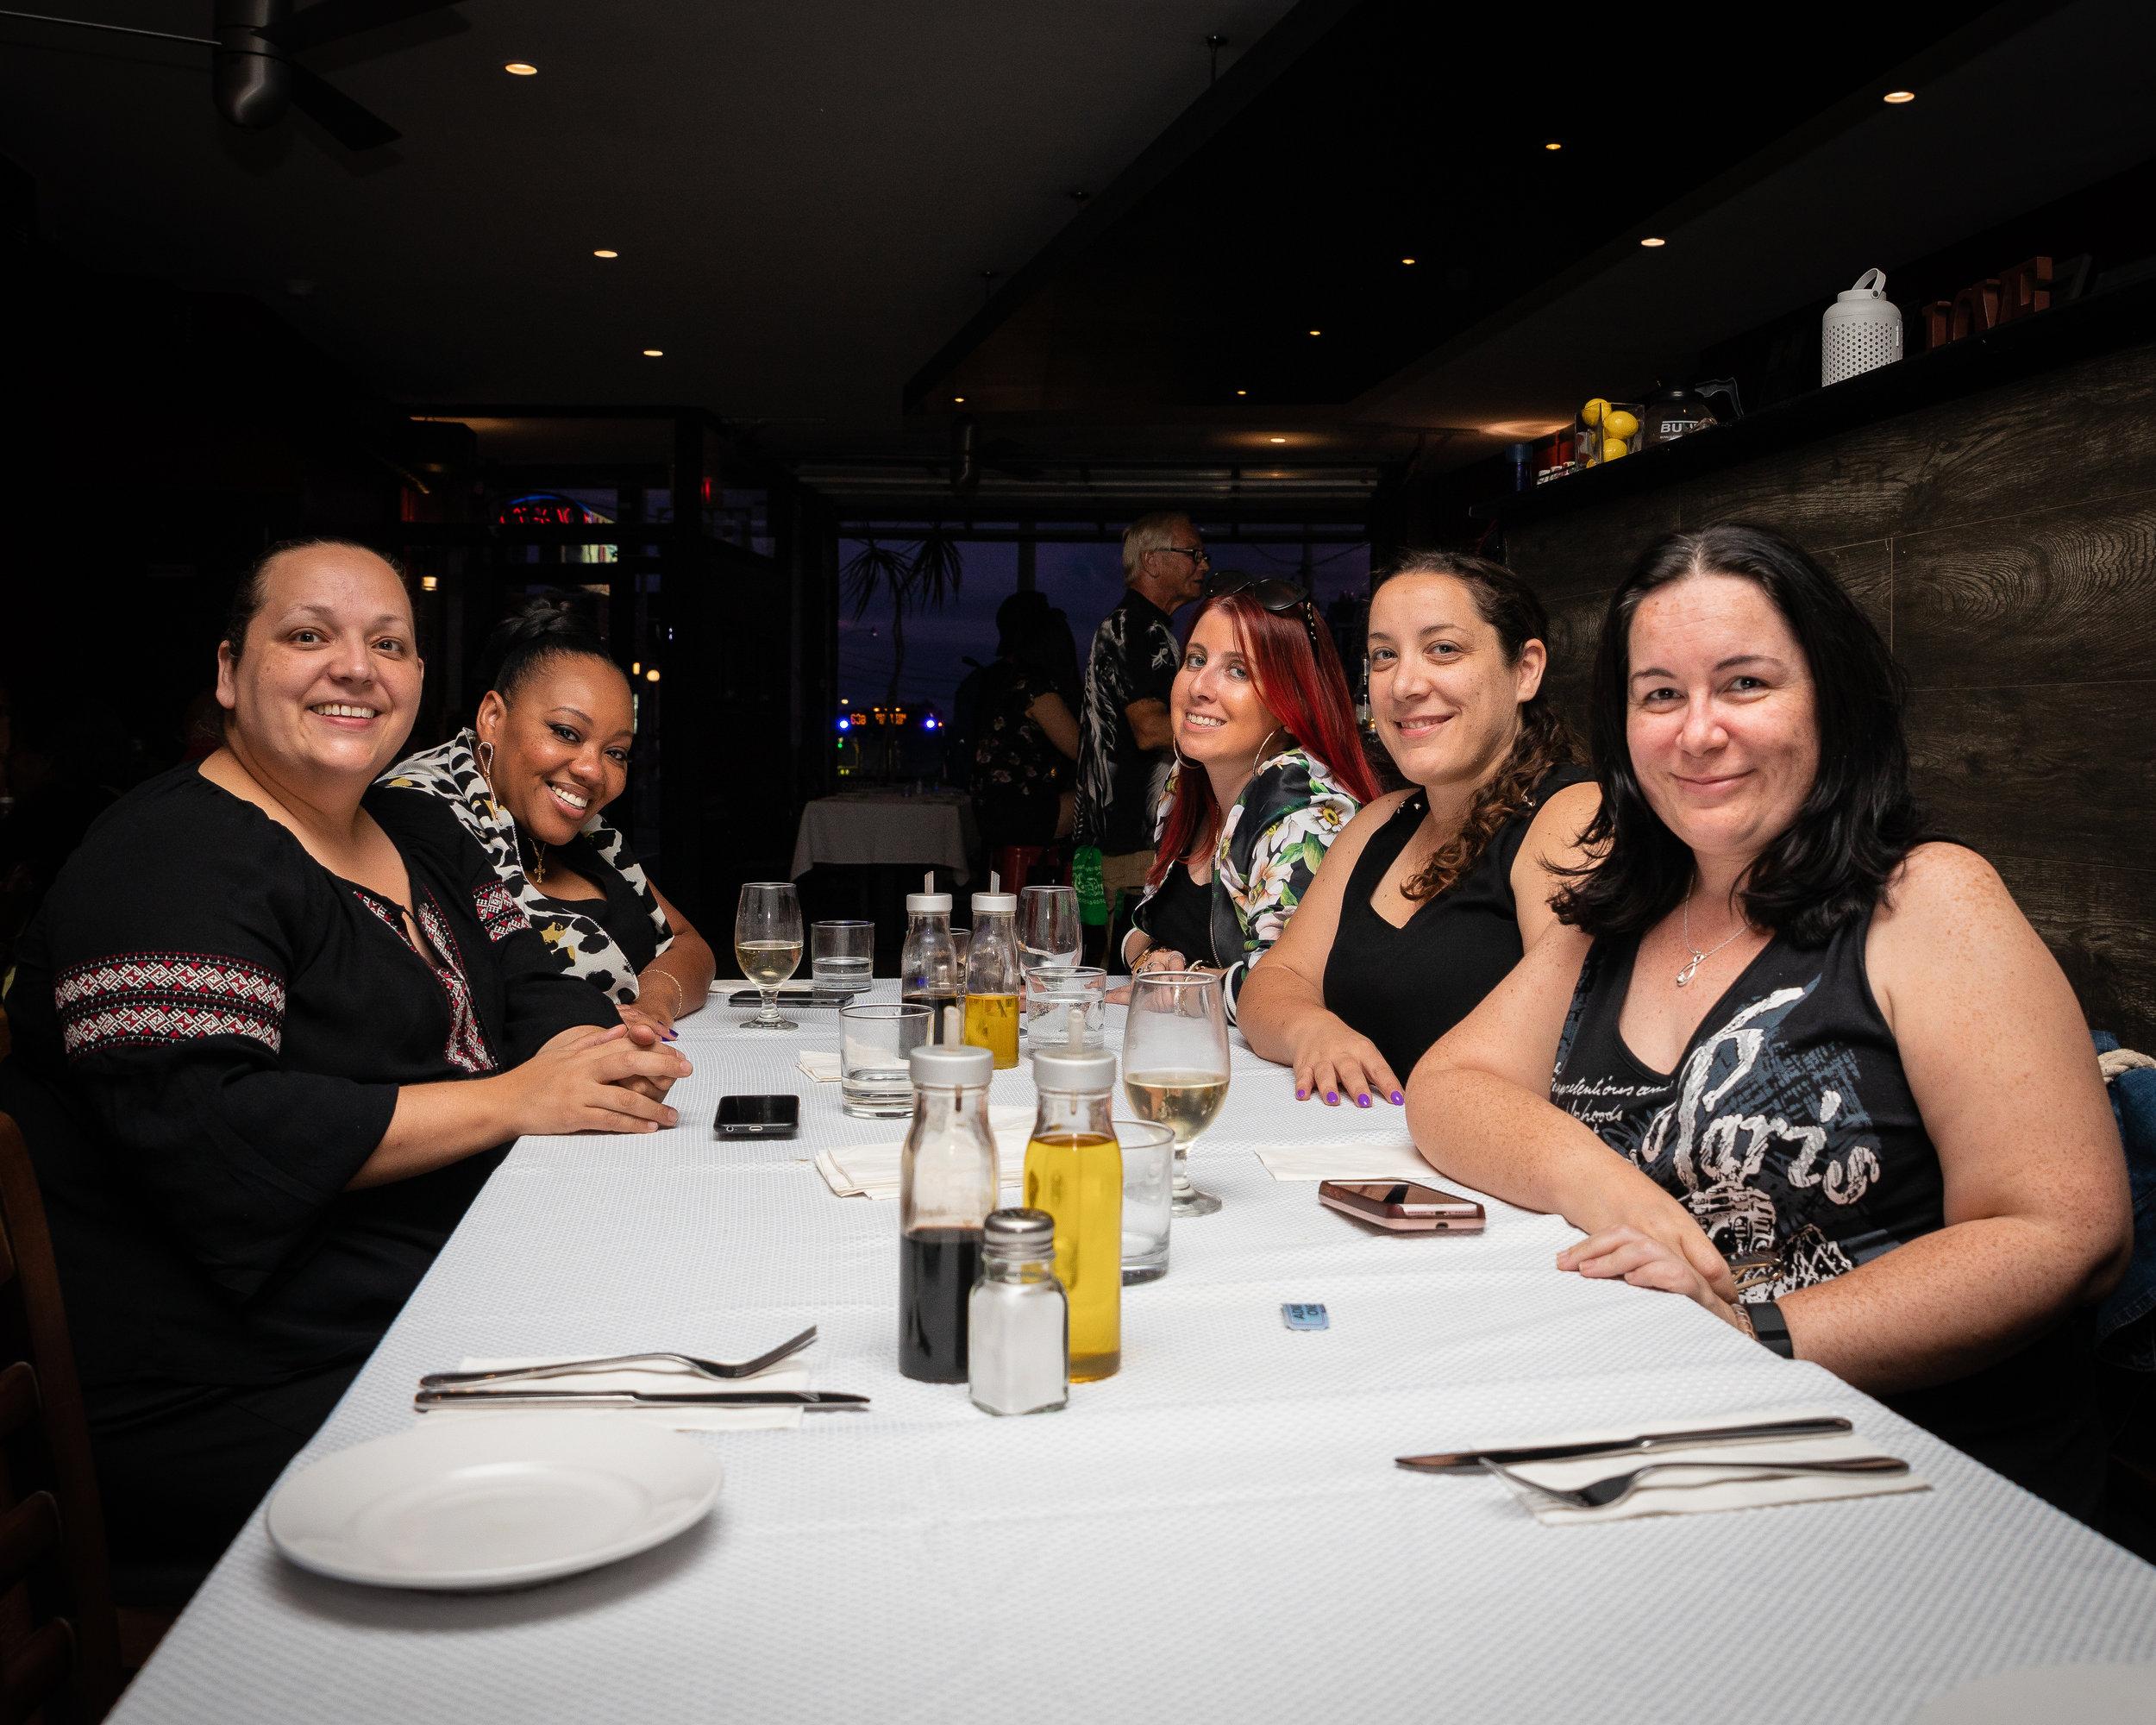 Scottie G of The Funky Bunch Live @ Salto Restaurant - Proofs-7.jpg